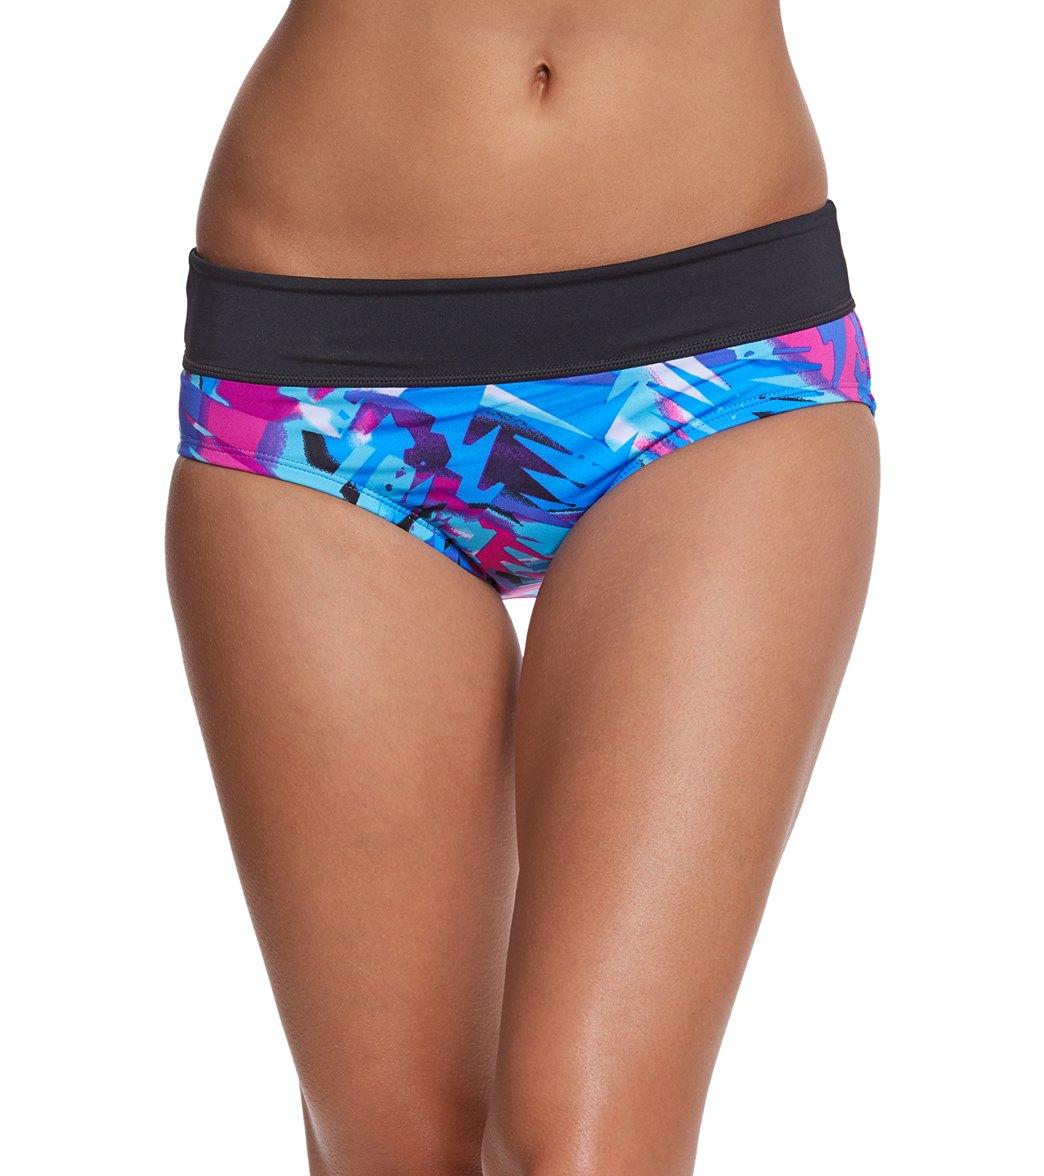 8017ca38e792c2 Nike Tropic Mod Bikini Bottom at SwimOutlet.com - Free Shipping